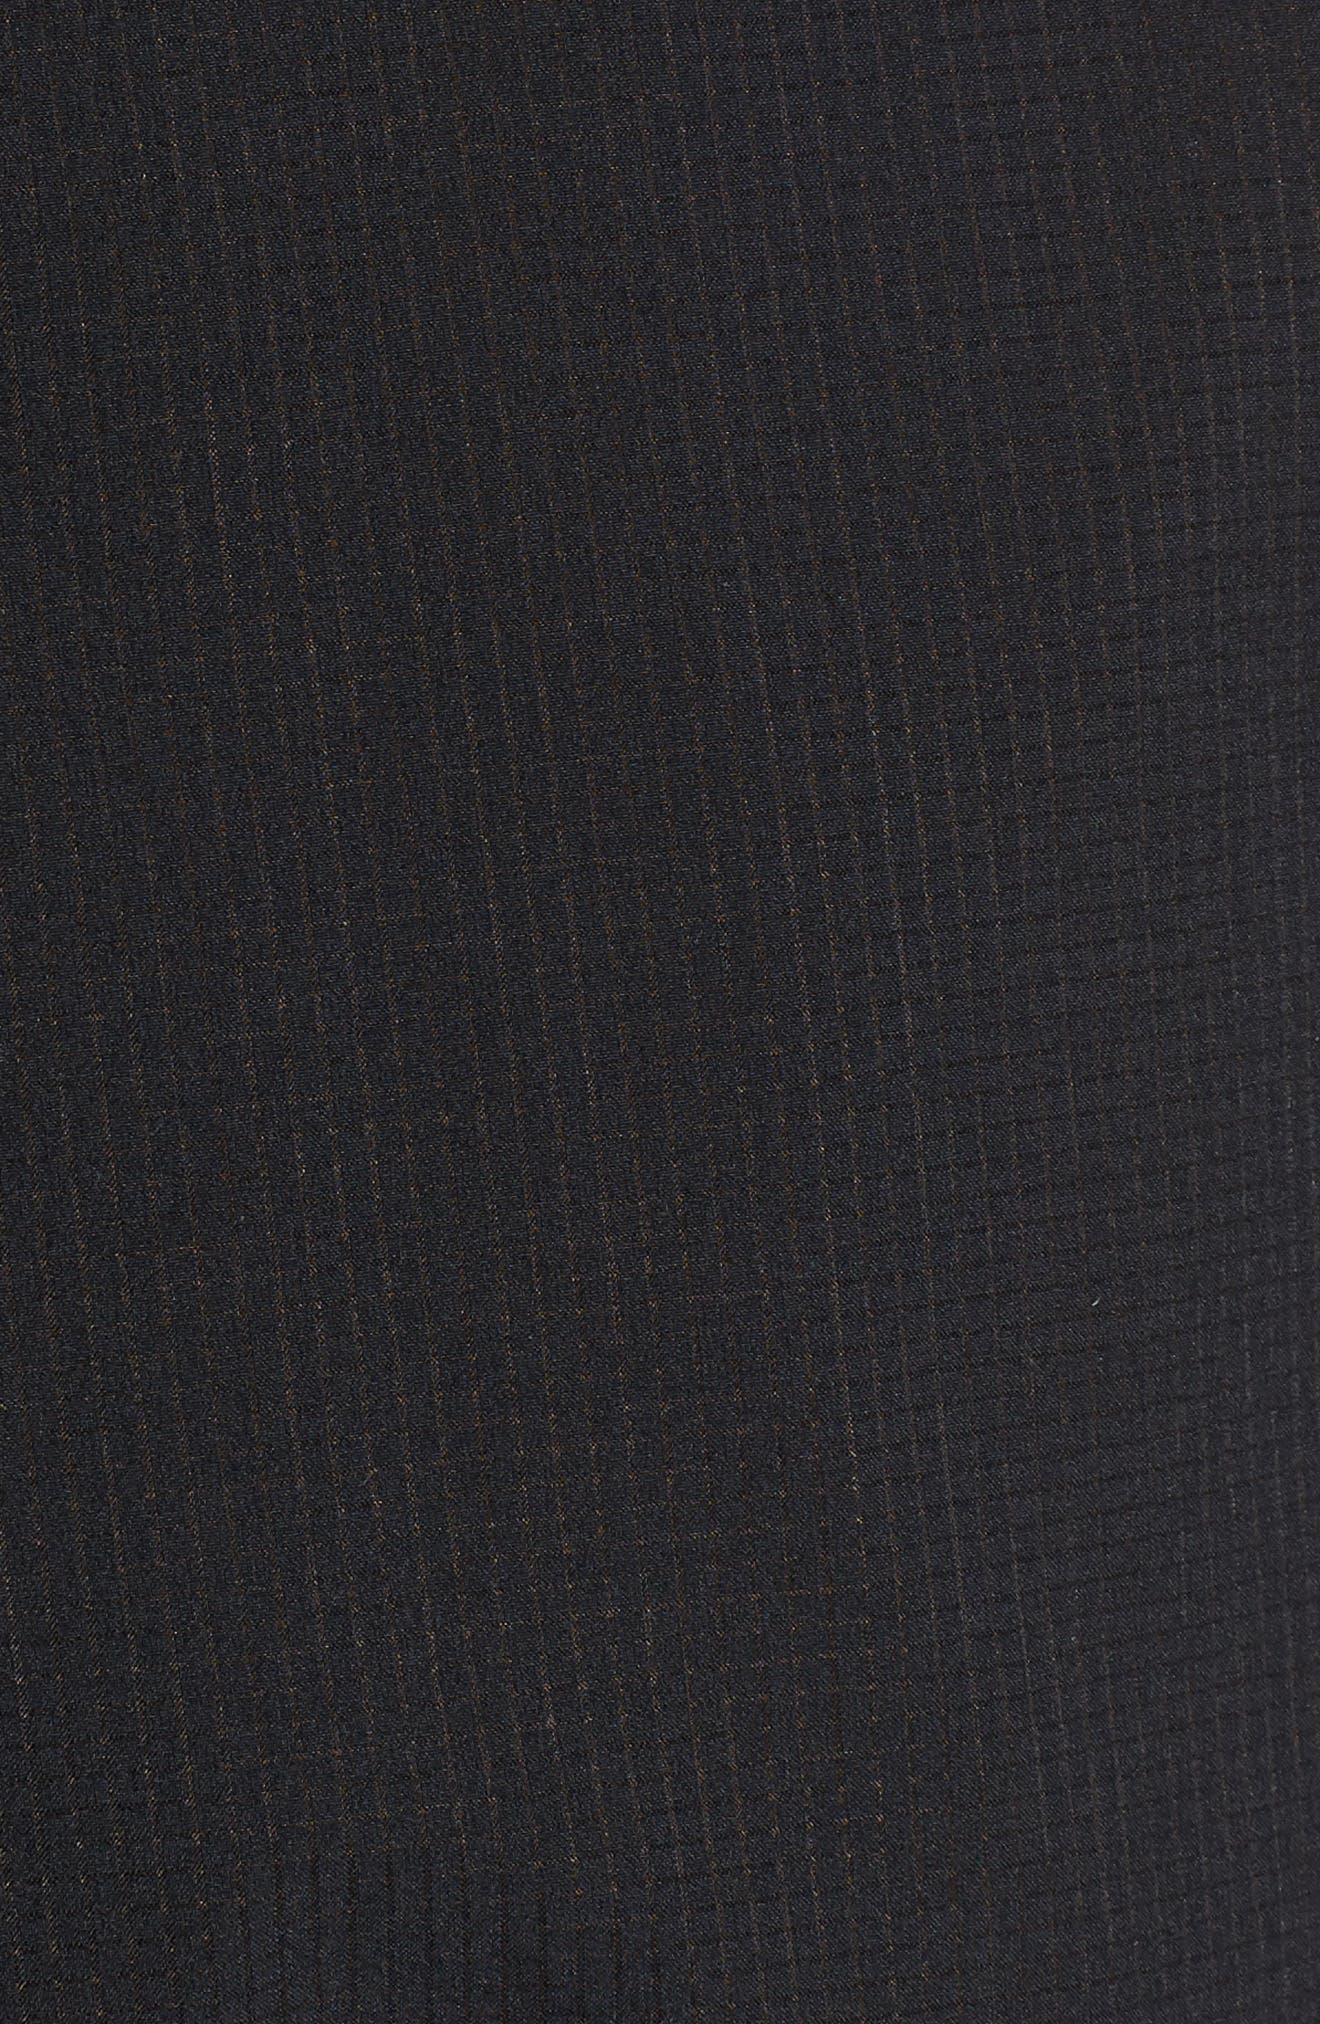 Epic Knit Shorts,                             Alternate thumbnail 5, color,                             005